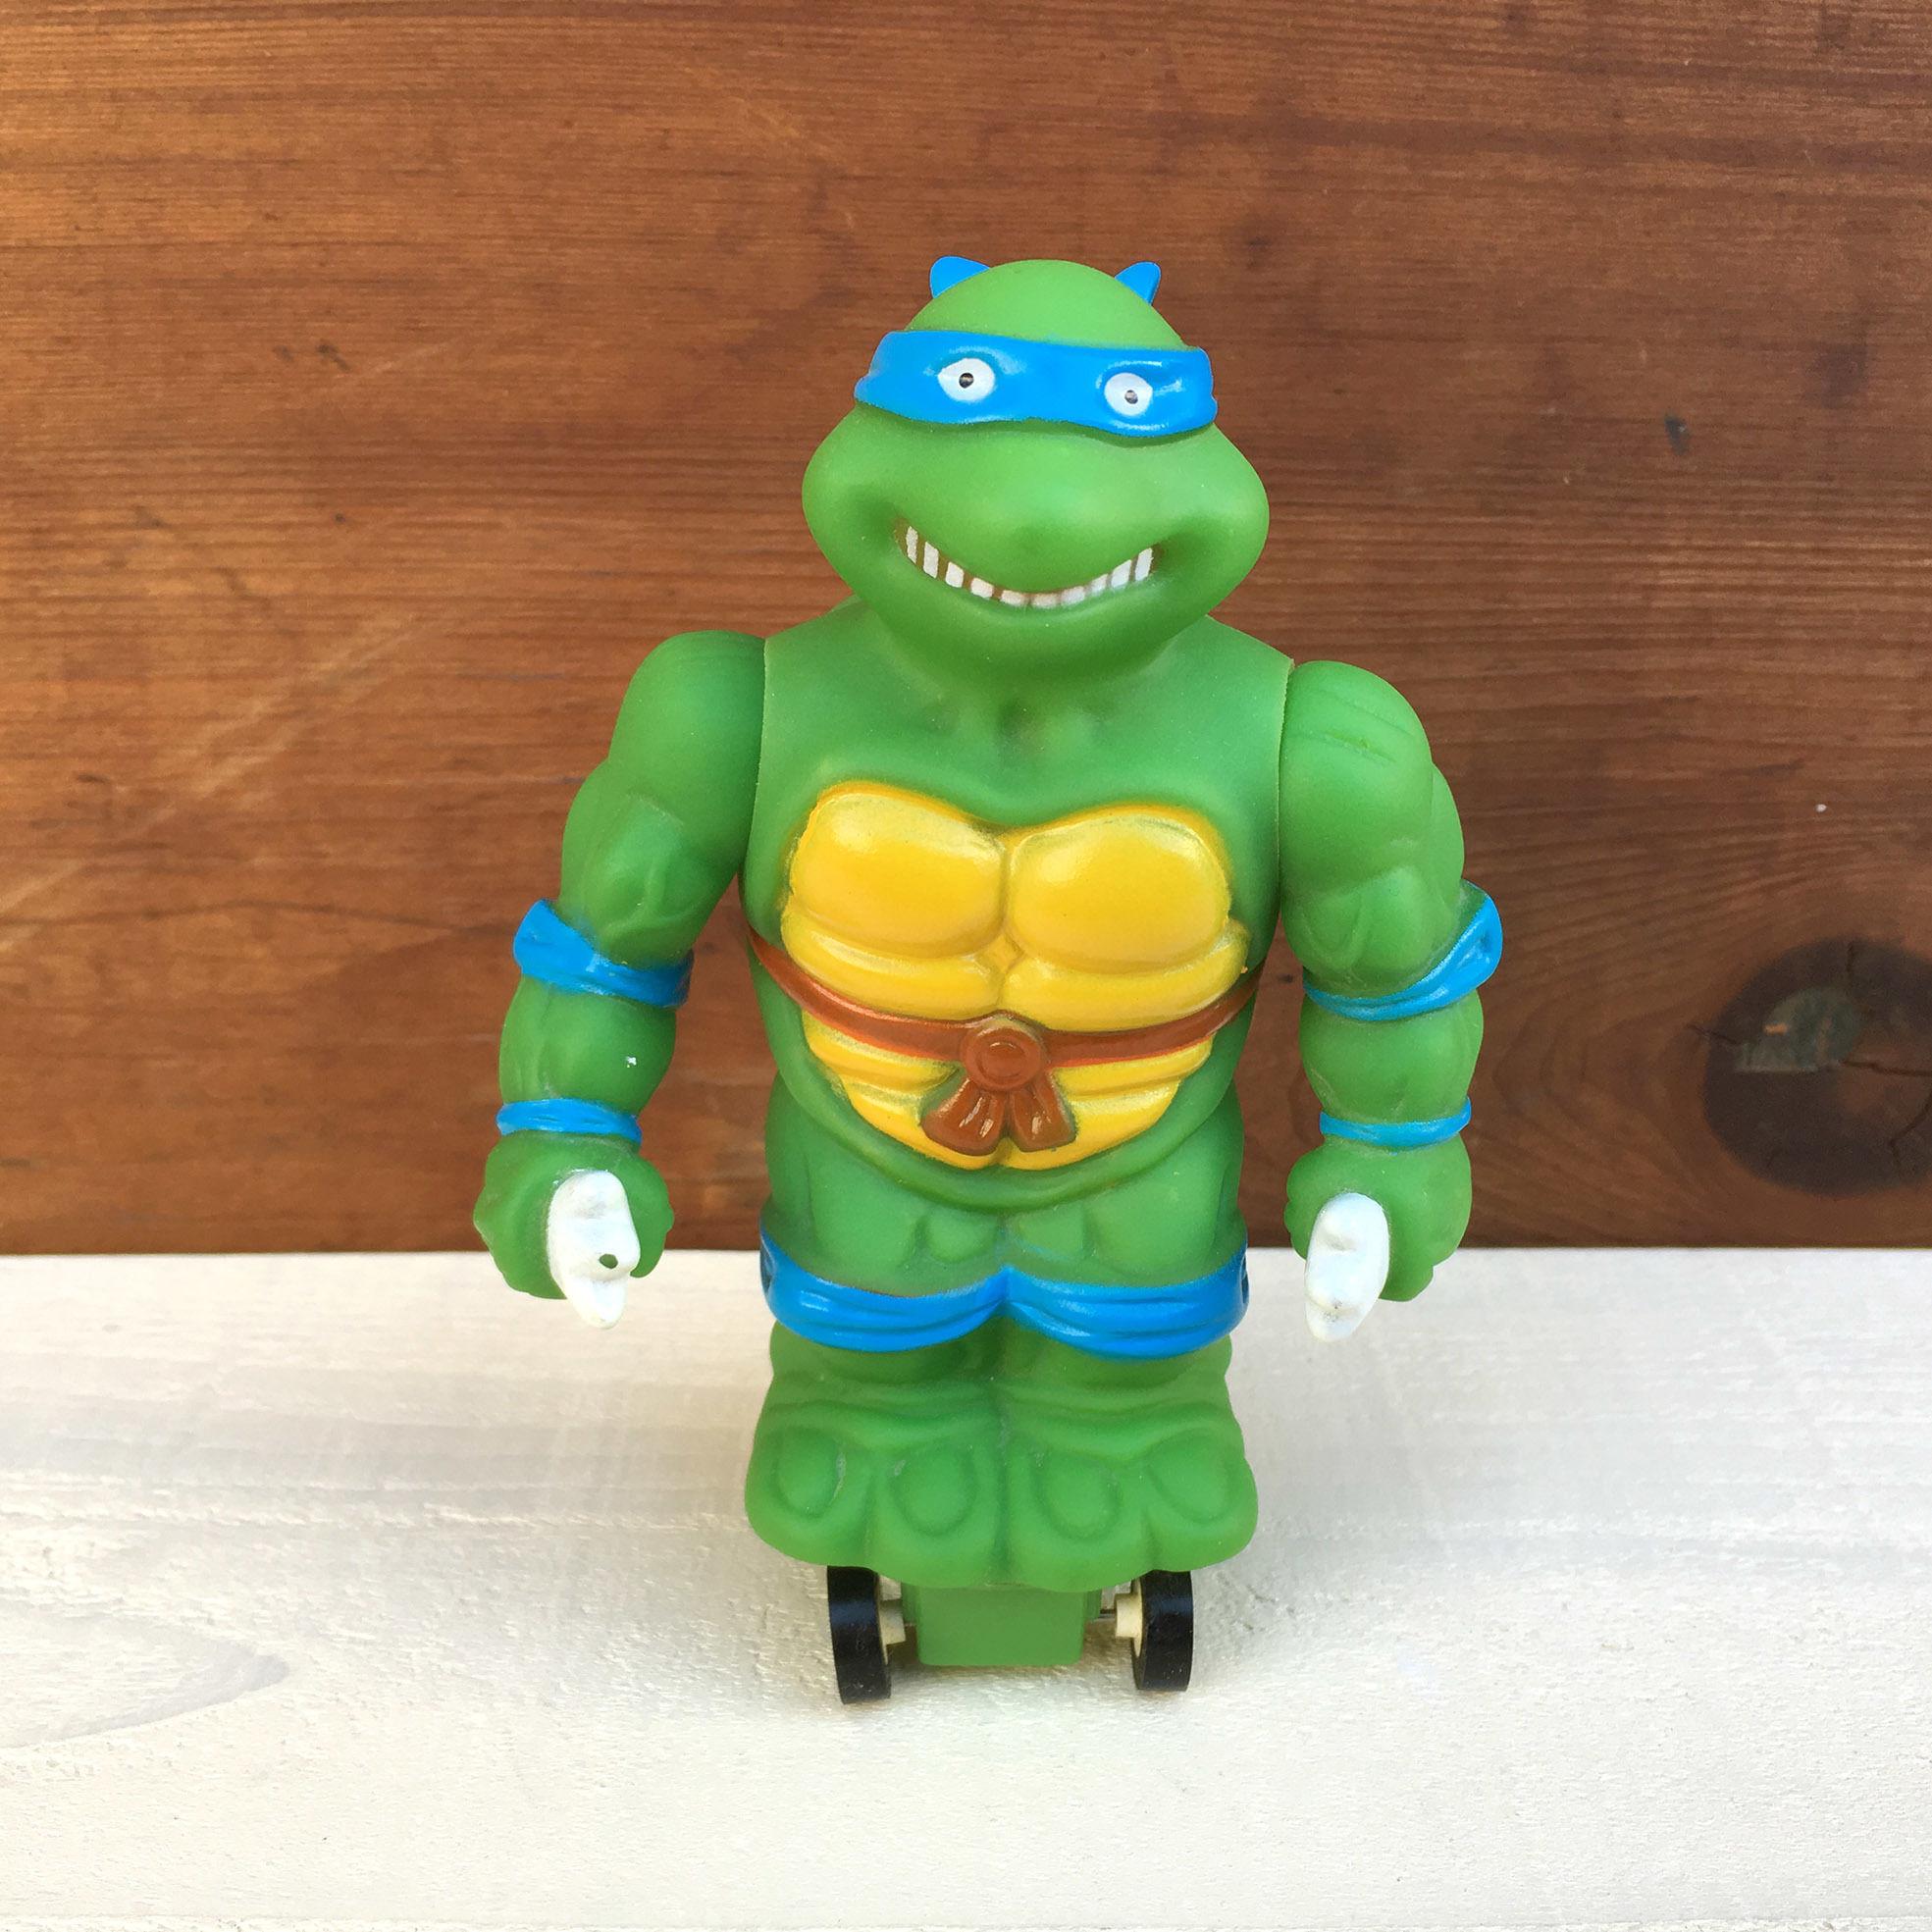 TURTLES Bootleg Turtles Figure/タートルズ ブートレグフィギュア/171214-6